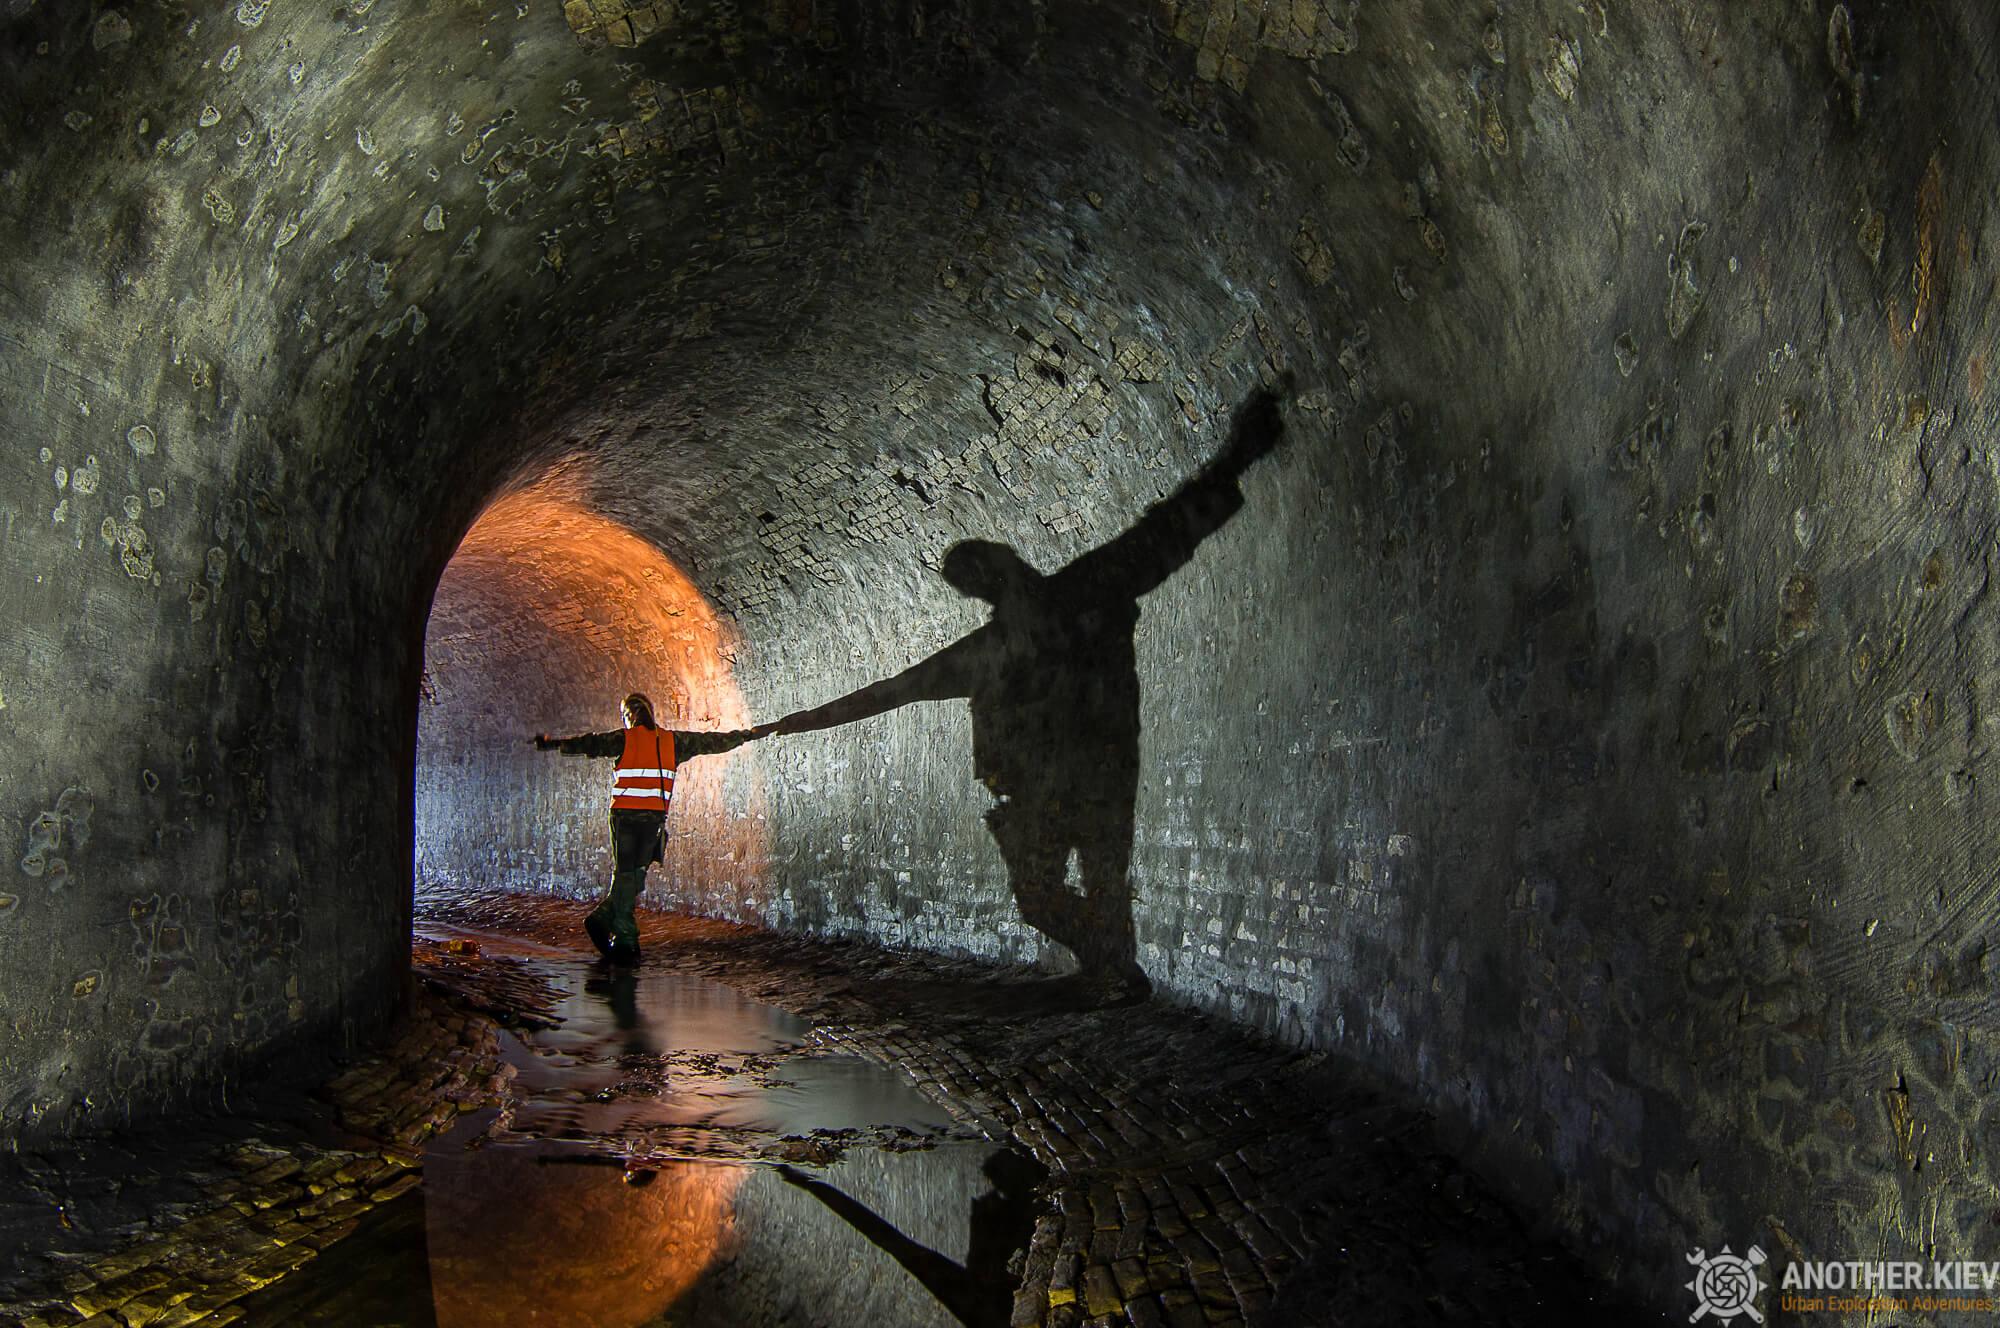 klov_IMGP3139 Underground River Klov